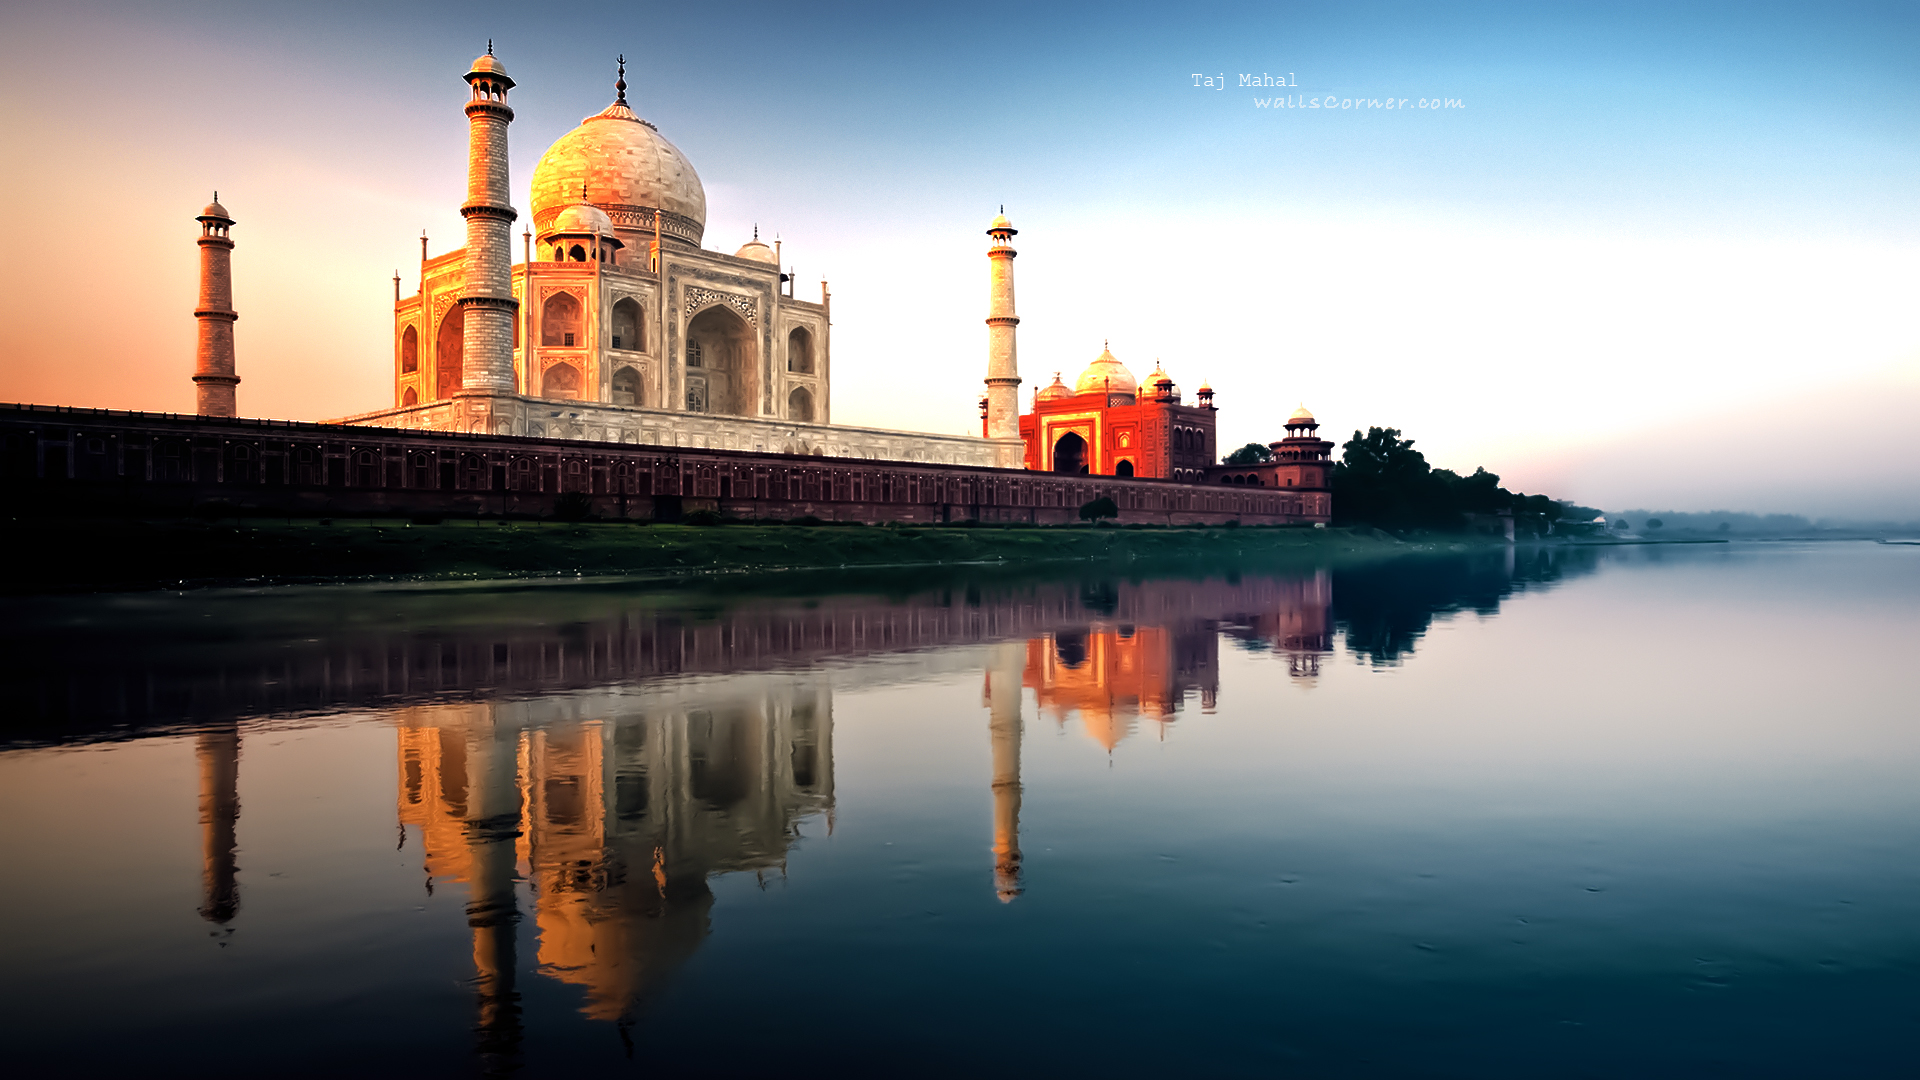 ... india wallpaper 8 ...